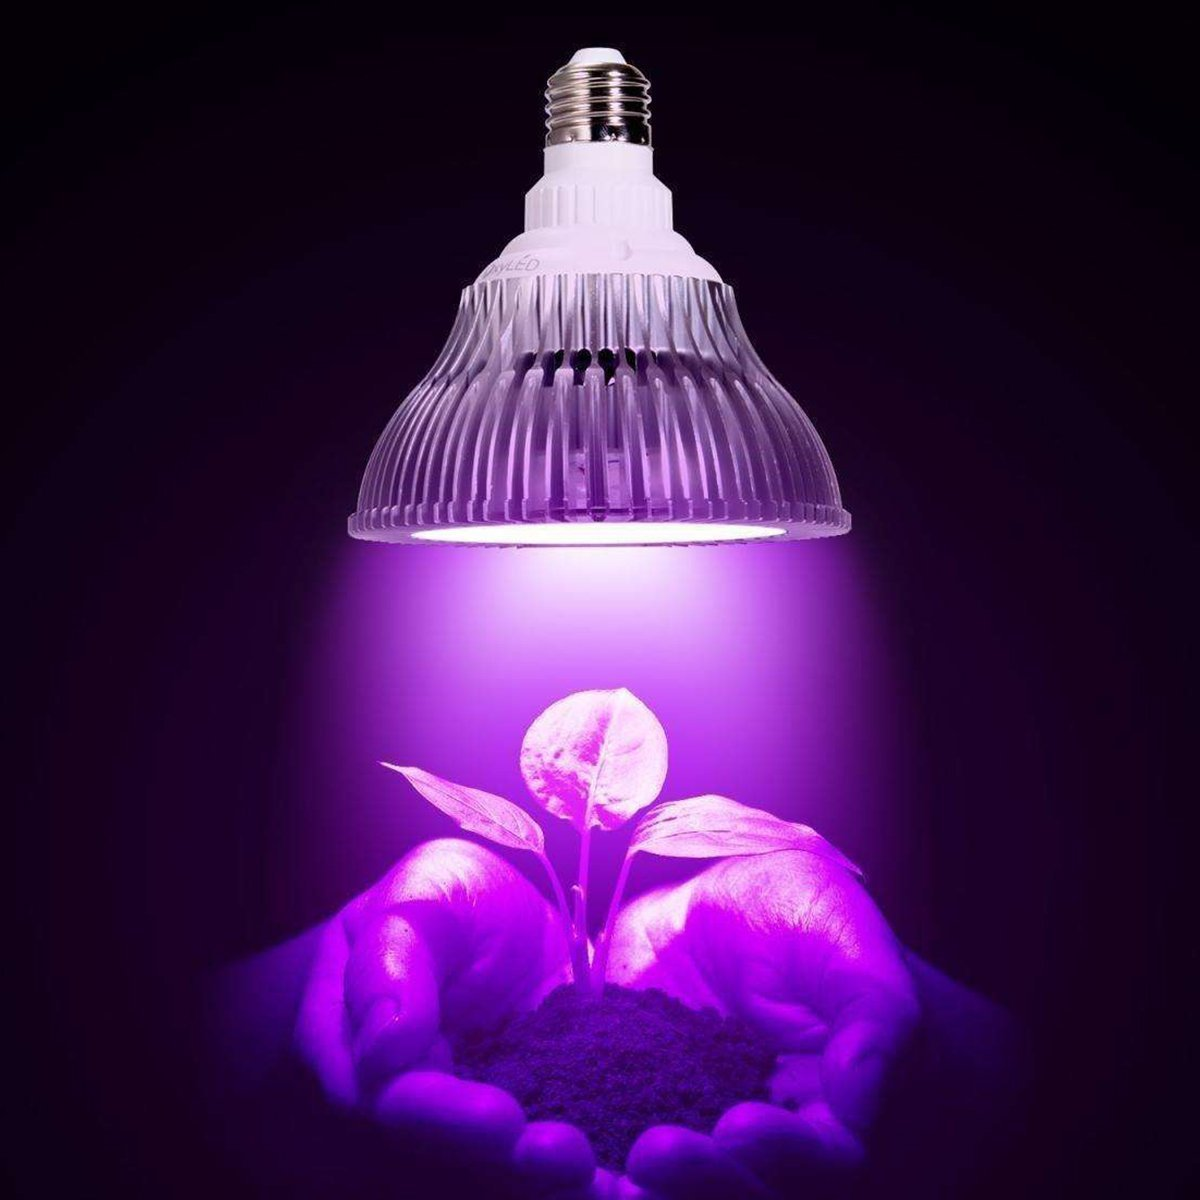 GALYGG 18W LED Grow Light Bulb,E26 Socket,Plant Lamp,for Indoor Plants,Hydroponics,Greenhouse Organic,Home,Garden Lighting (3 Blue/15 Red)